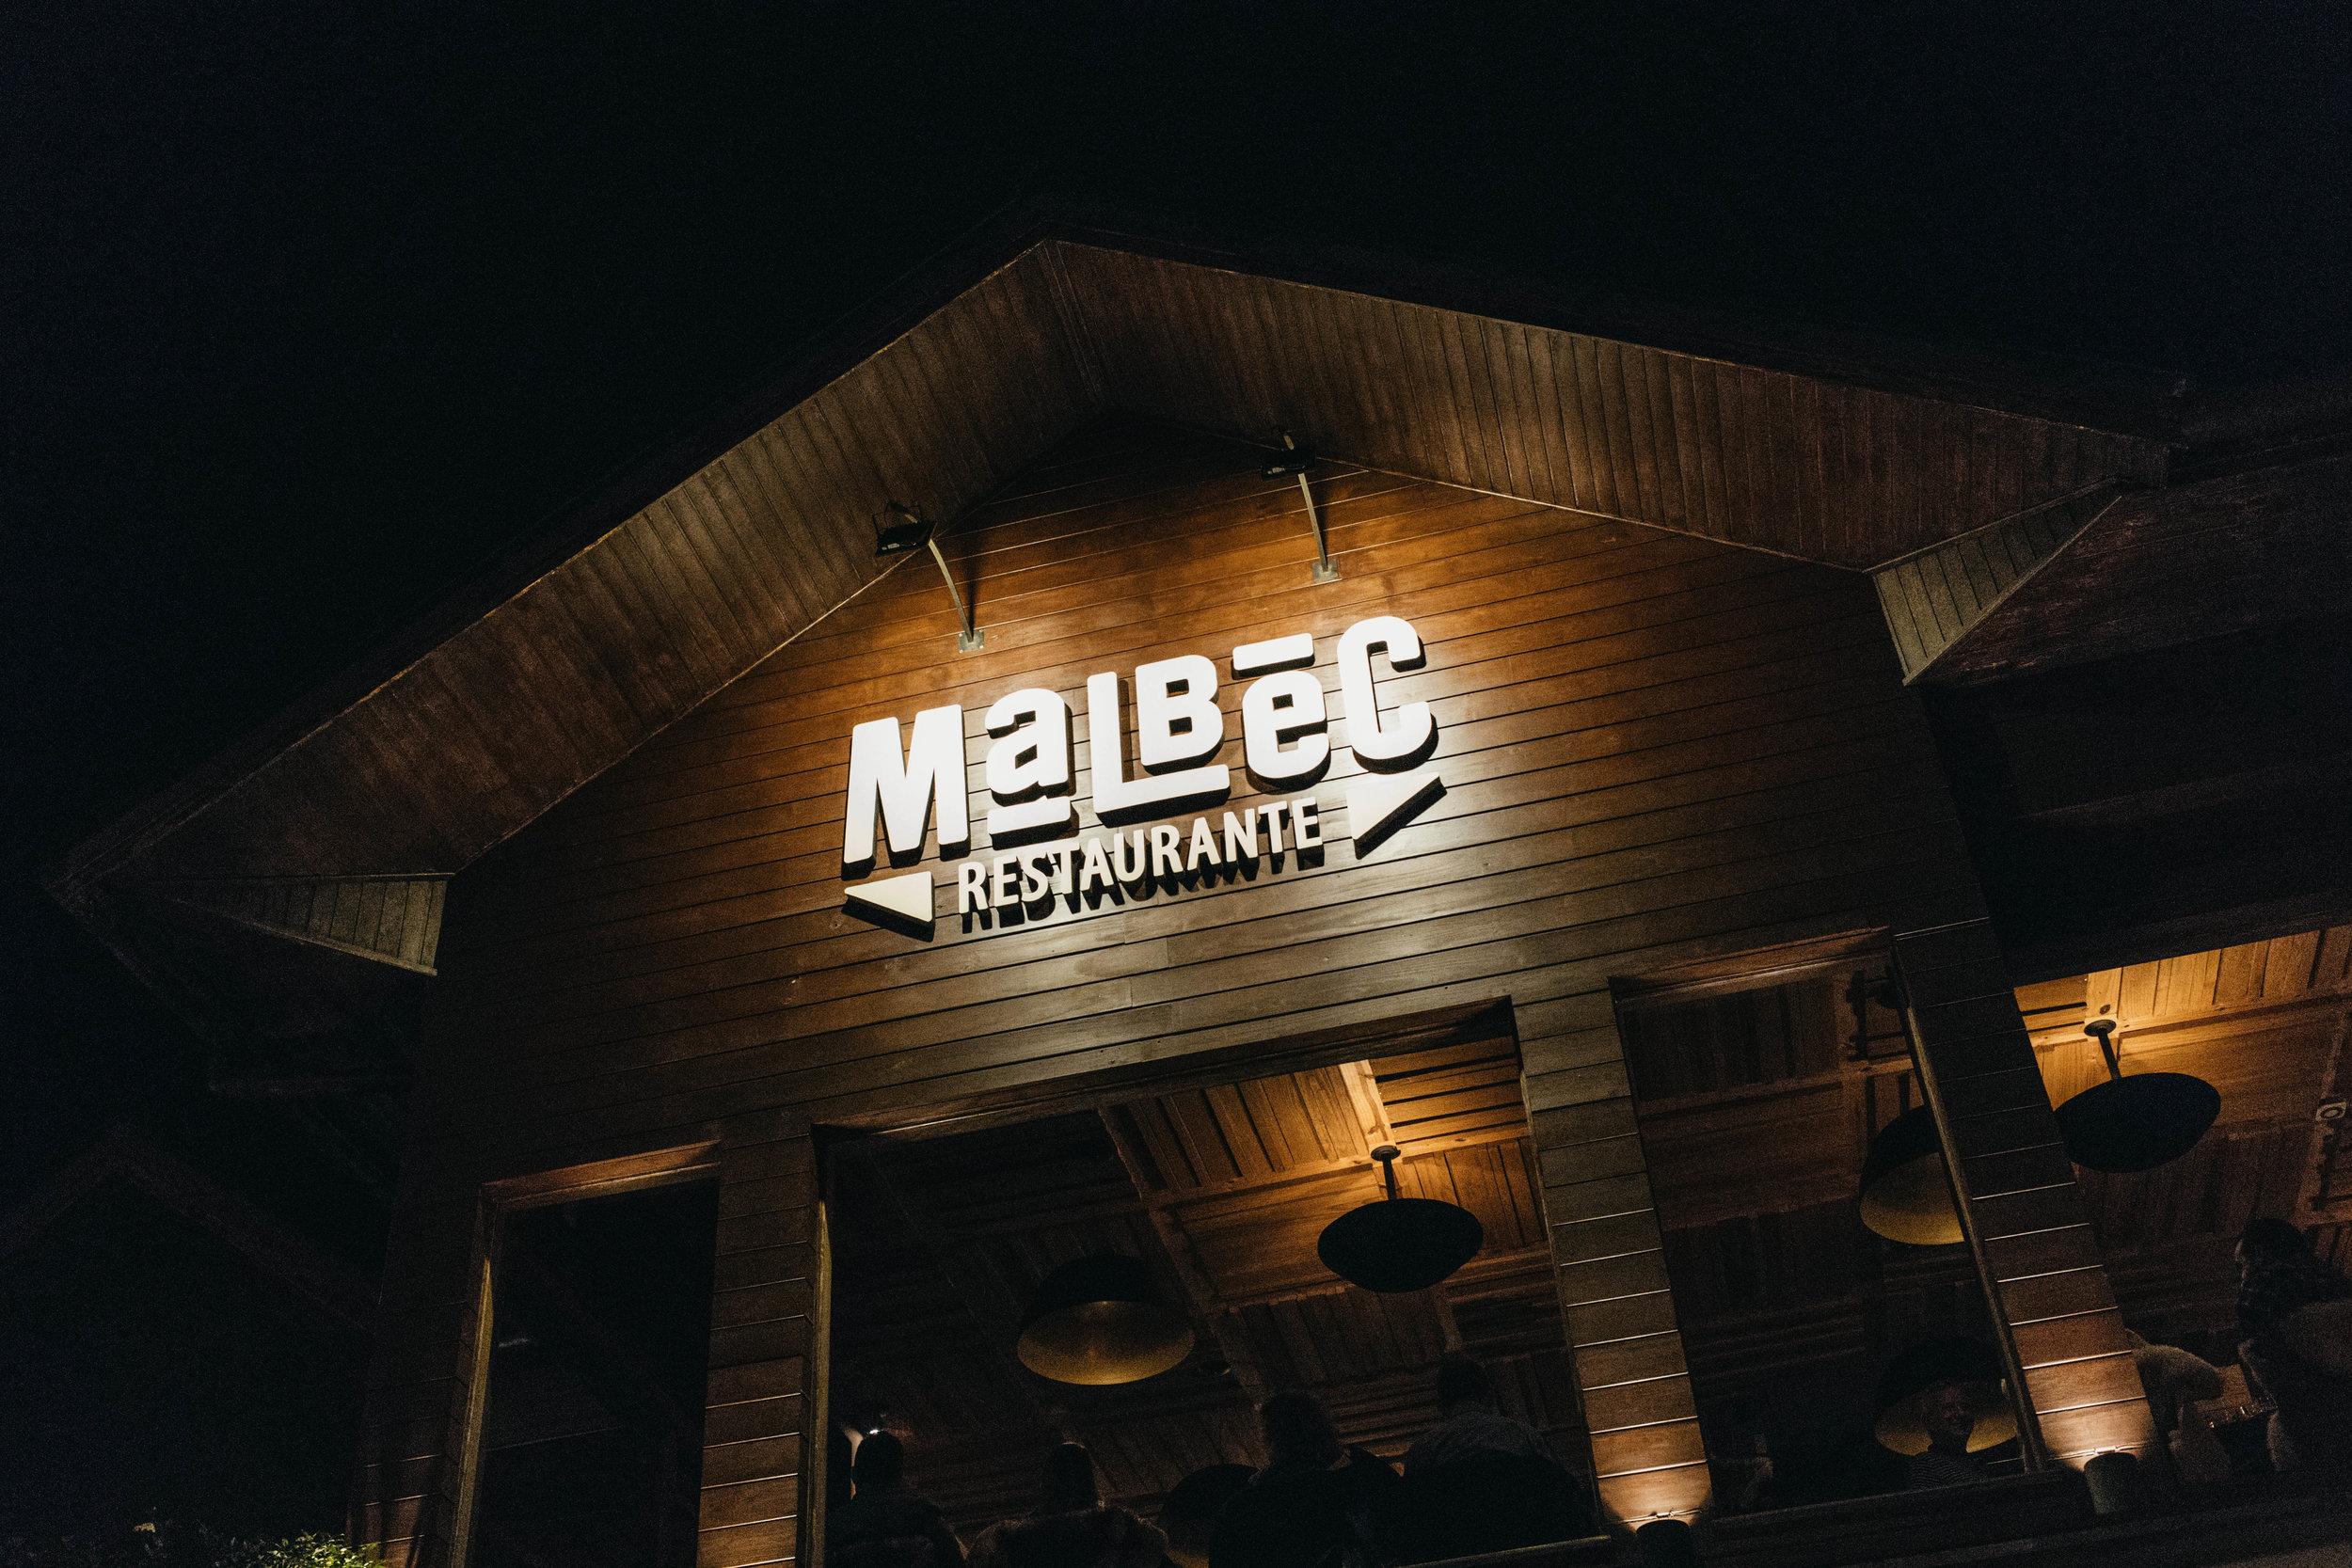 restaurante malbec gramado onde comer